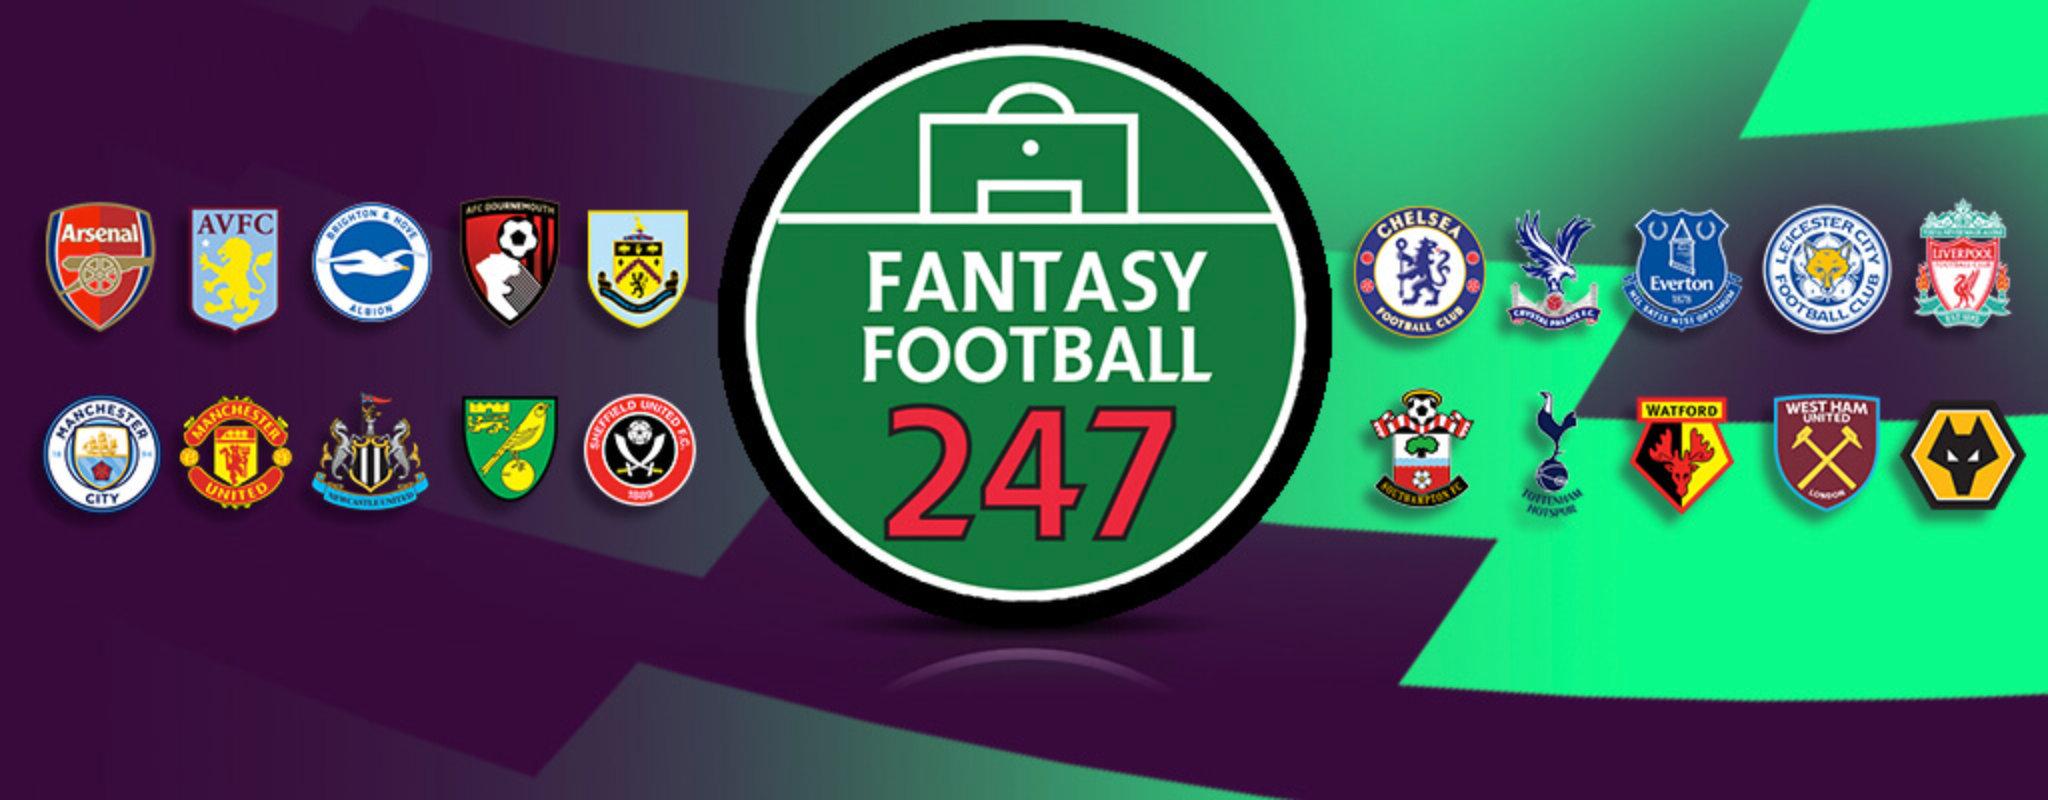 Fantasy Football Fixture Tracker FPL 2019/20 - Fantasy